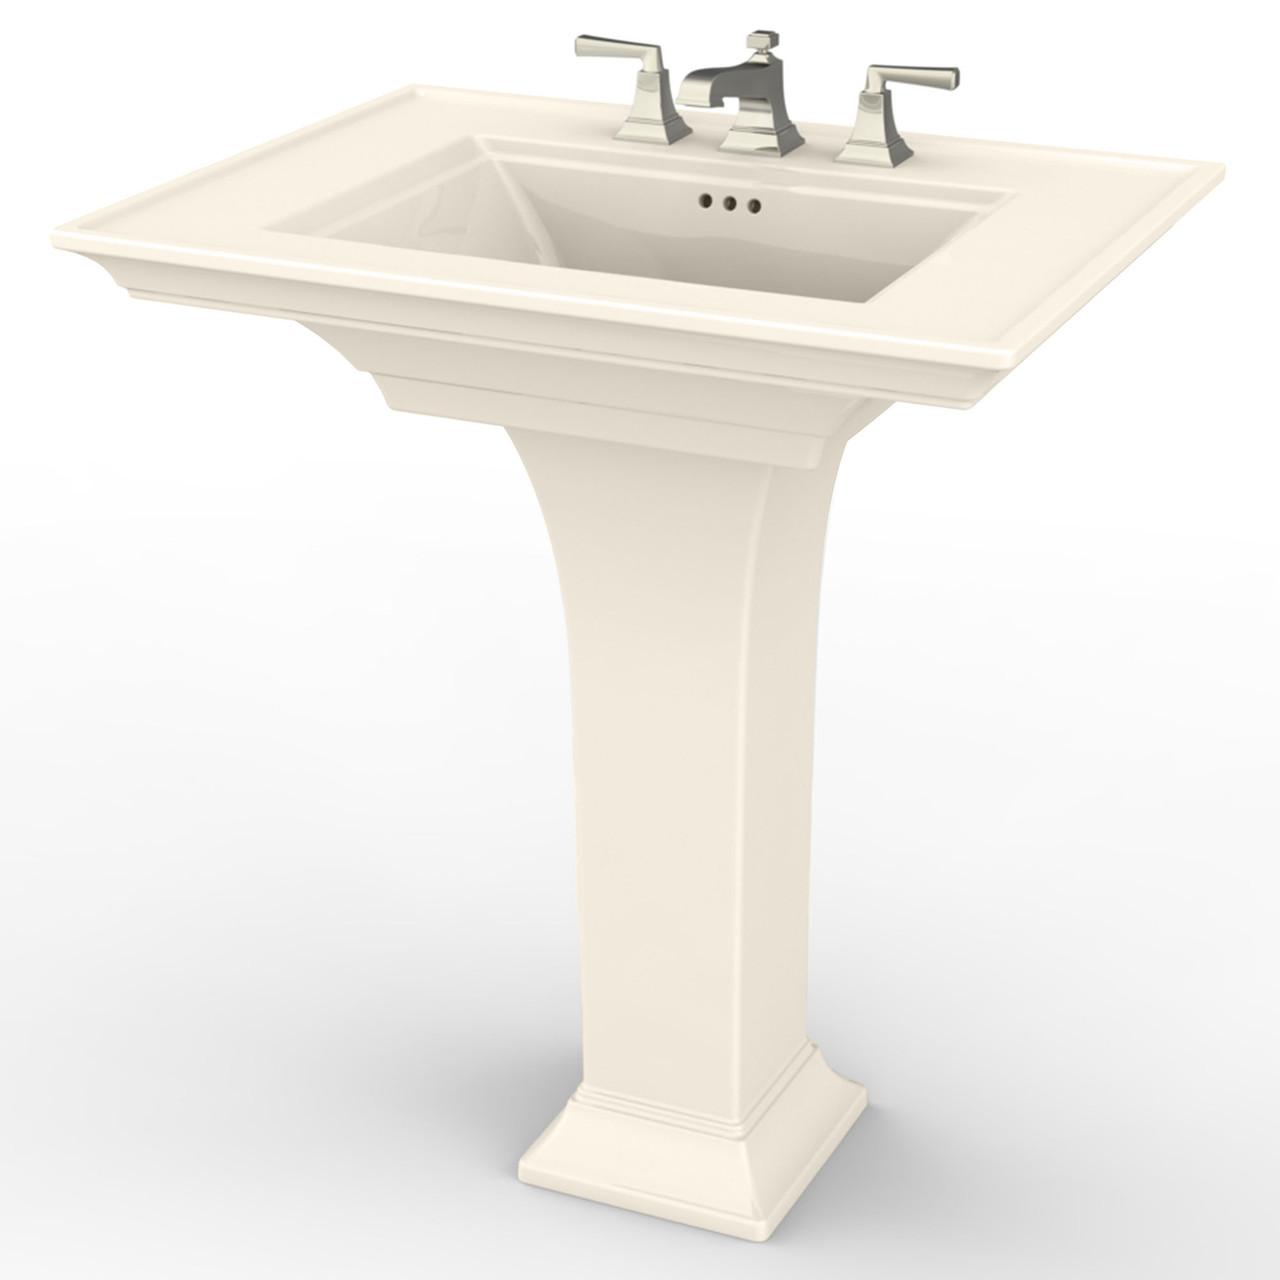 american standard 0297800 222 town square s fine fireclay 30 in rectangular pedestal sink